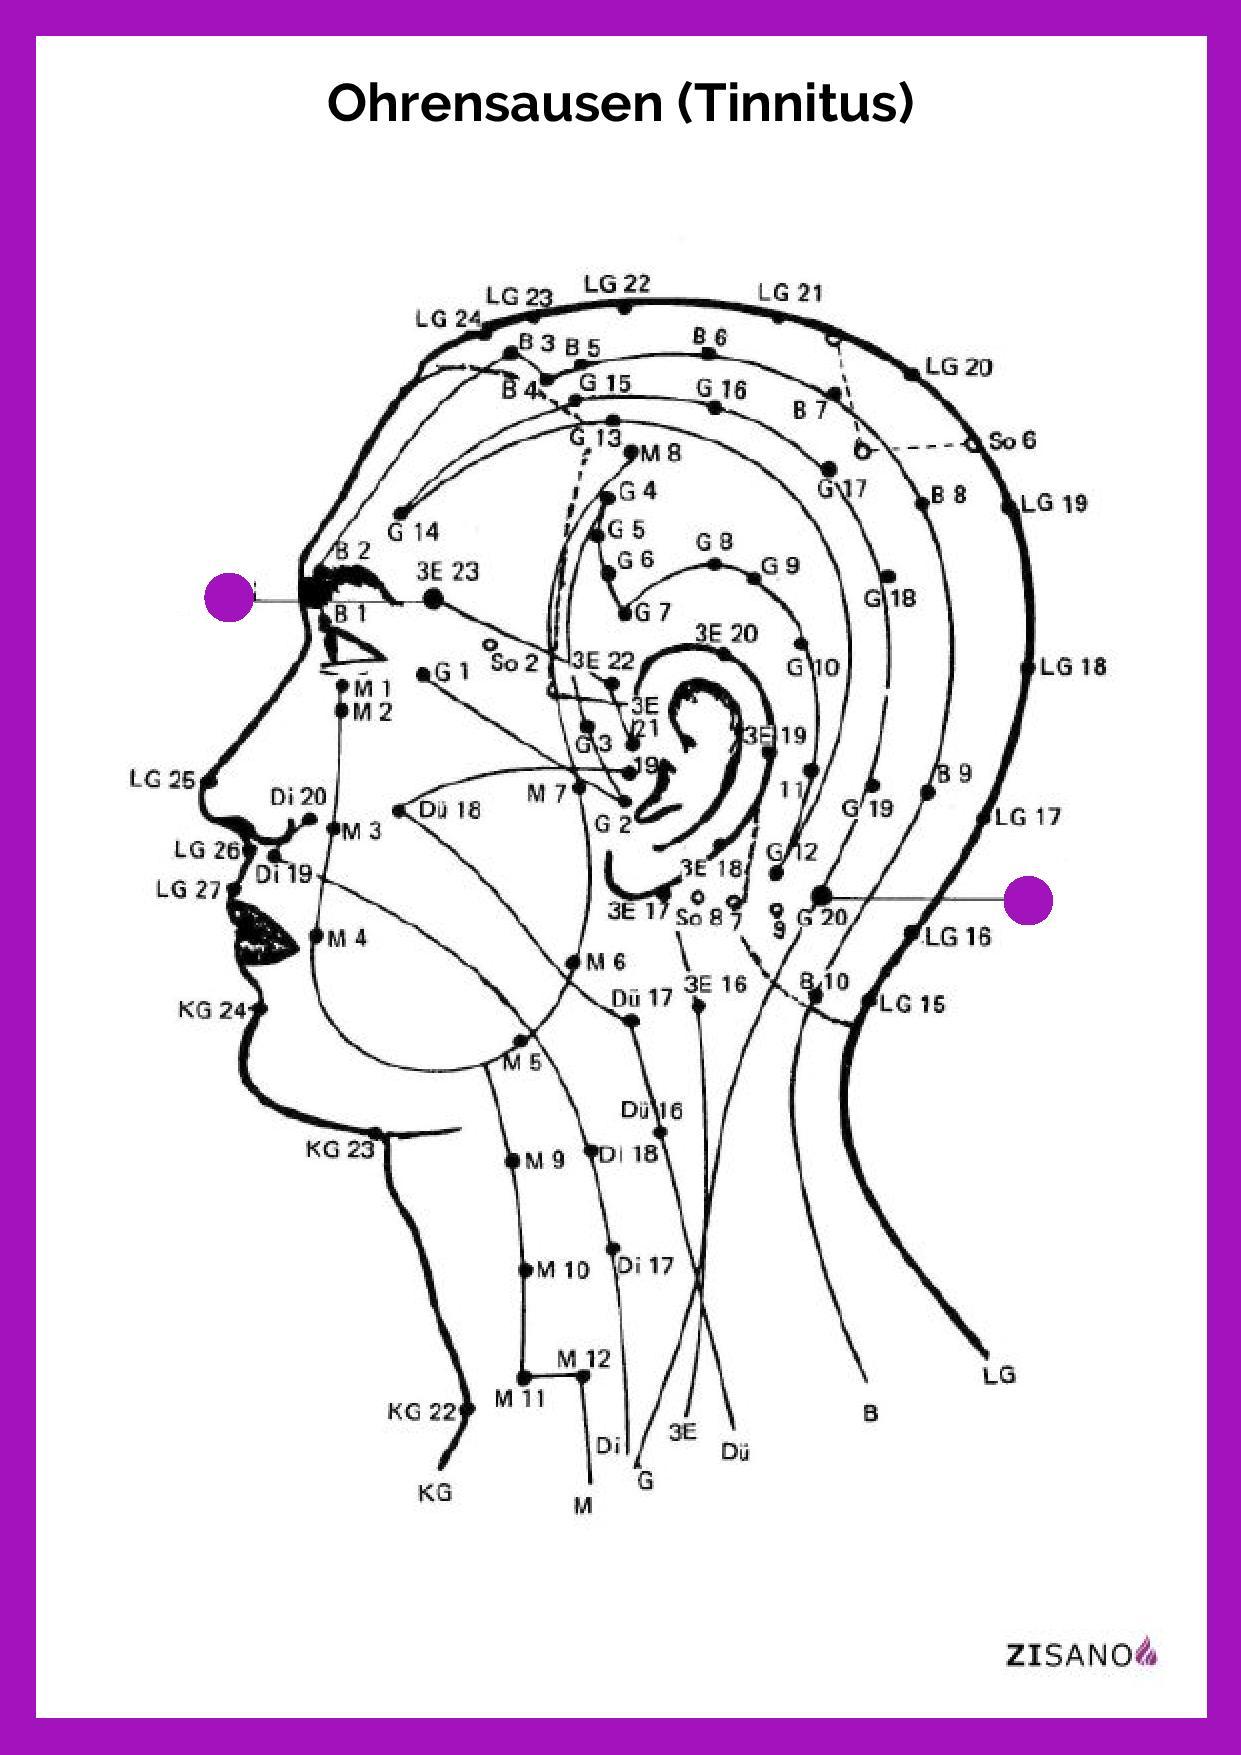 Ohrensausen Tinnitus Beschwerden Ursachen Schmerzlinderung Behandlung